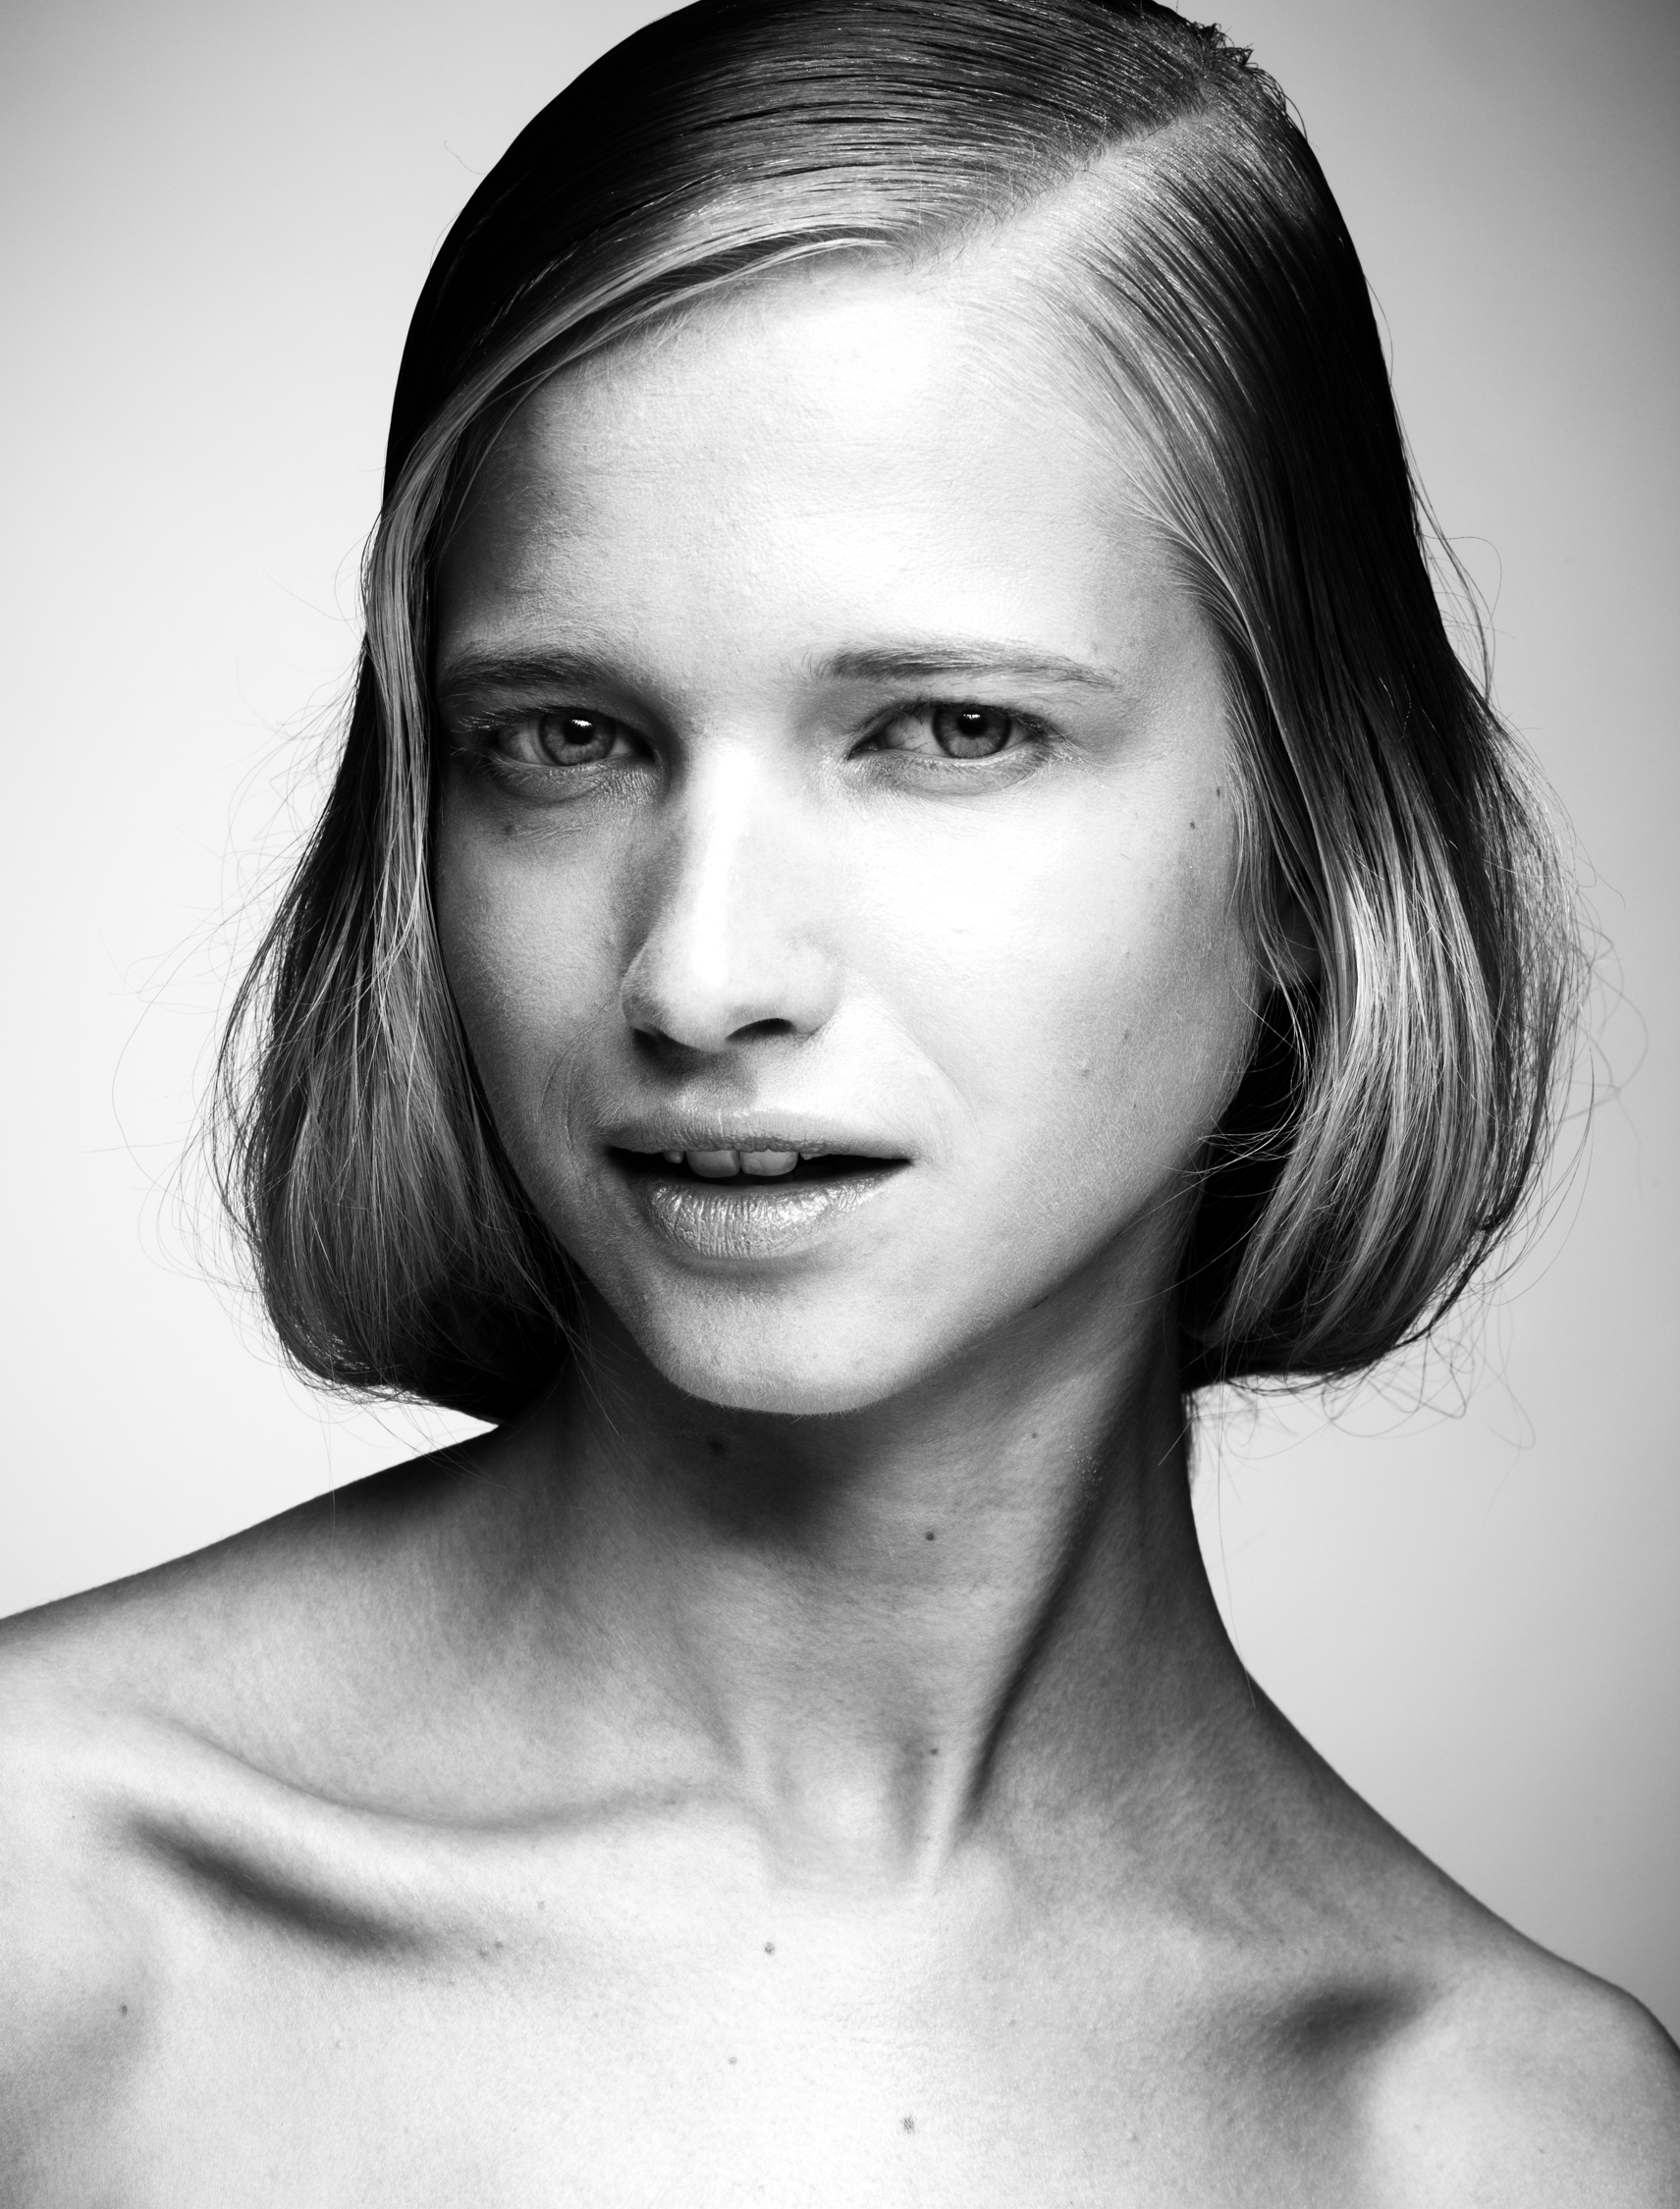 beautytest-charlotte-bos-shot1-oct2013-108.jpg